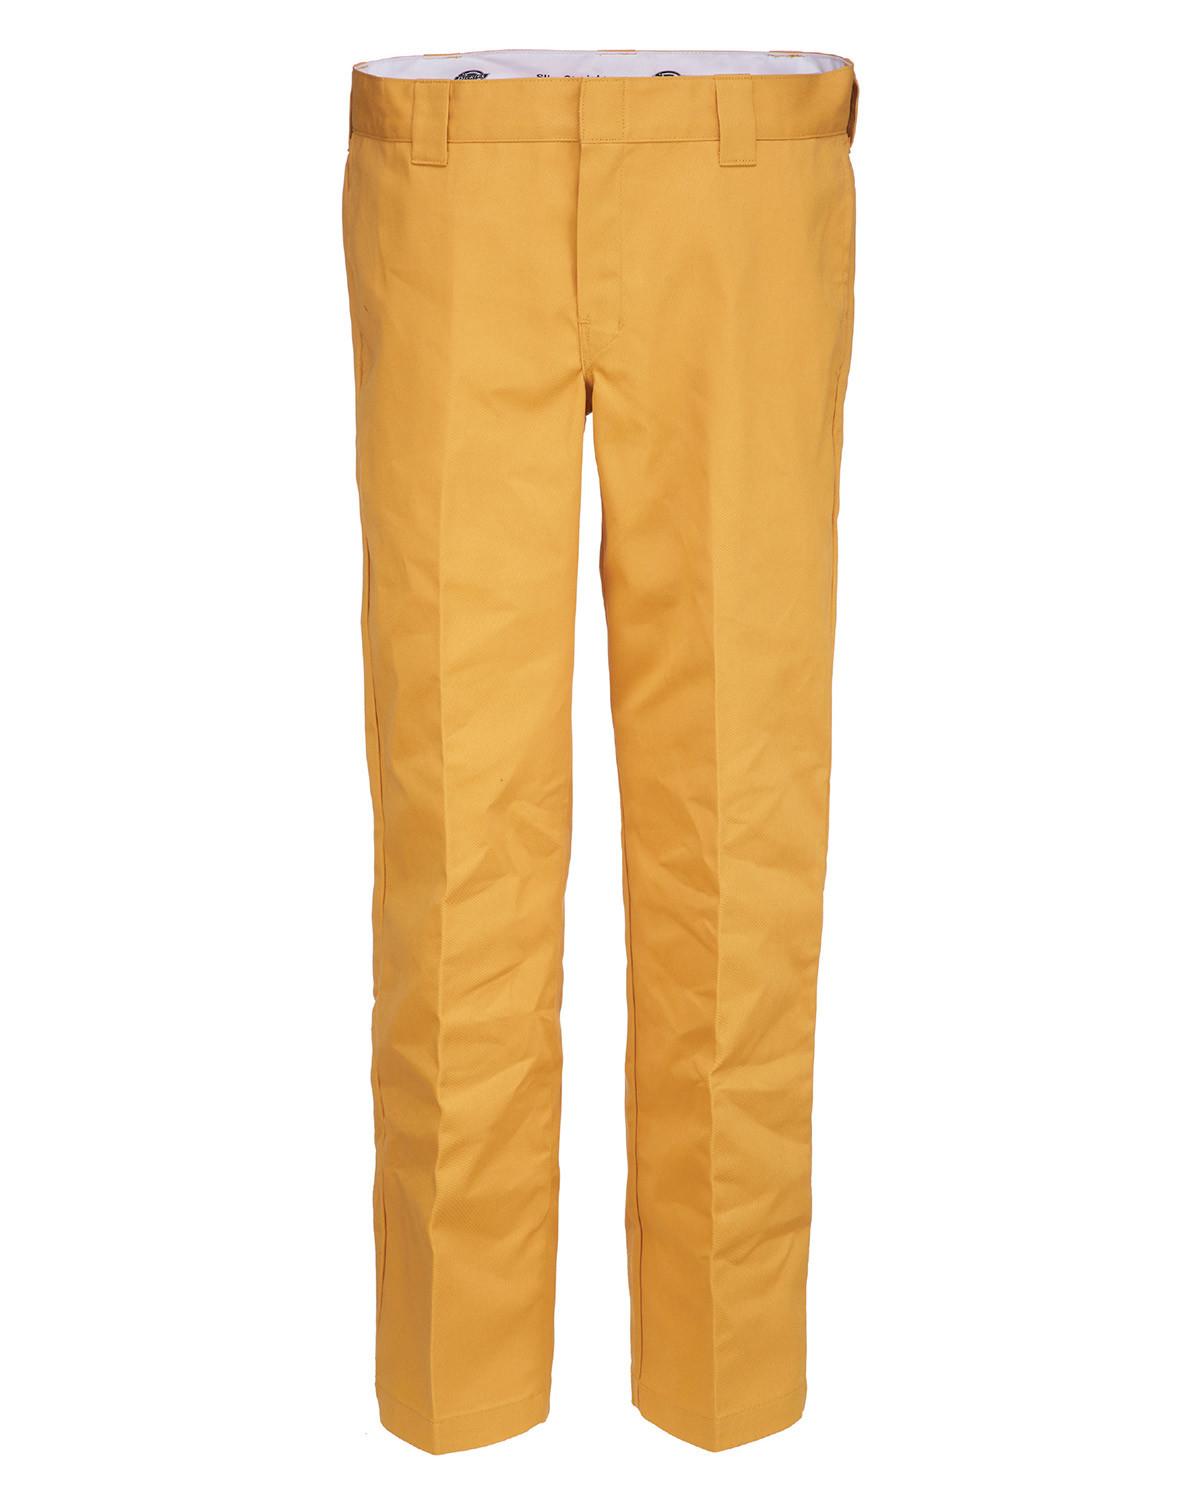 Dickies 873 Slim Straight Work Pant (Dijon, W42 / L32)